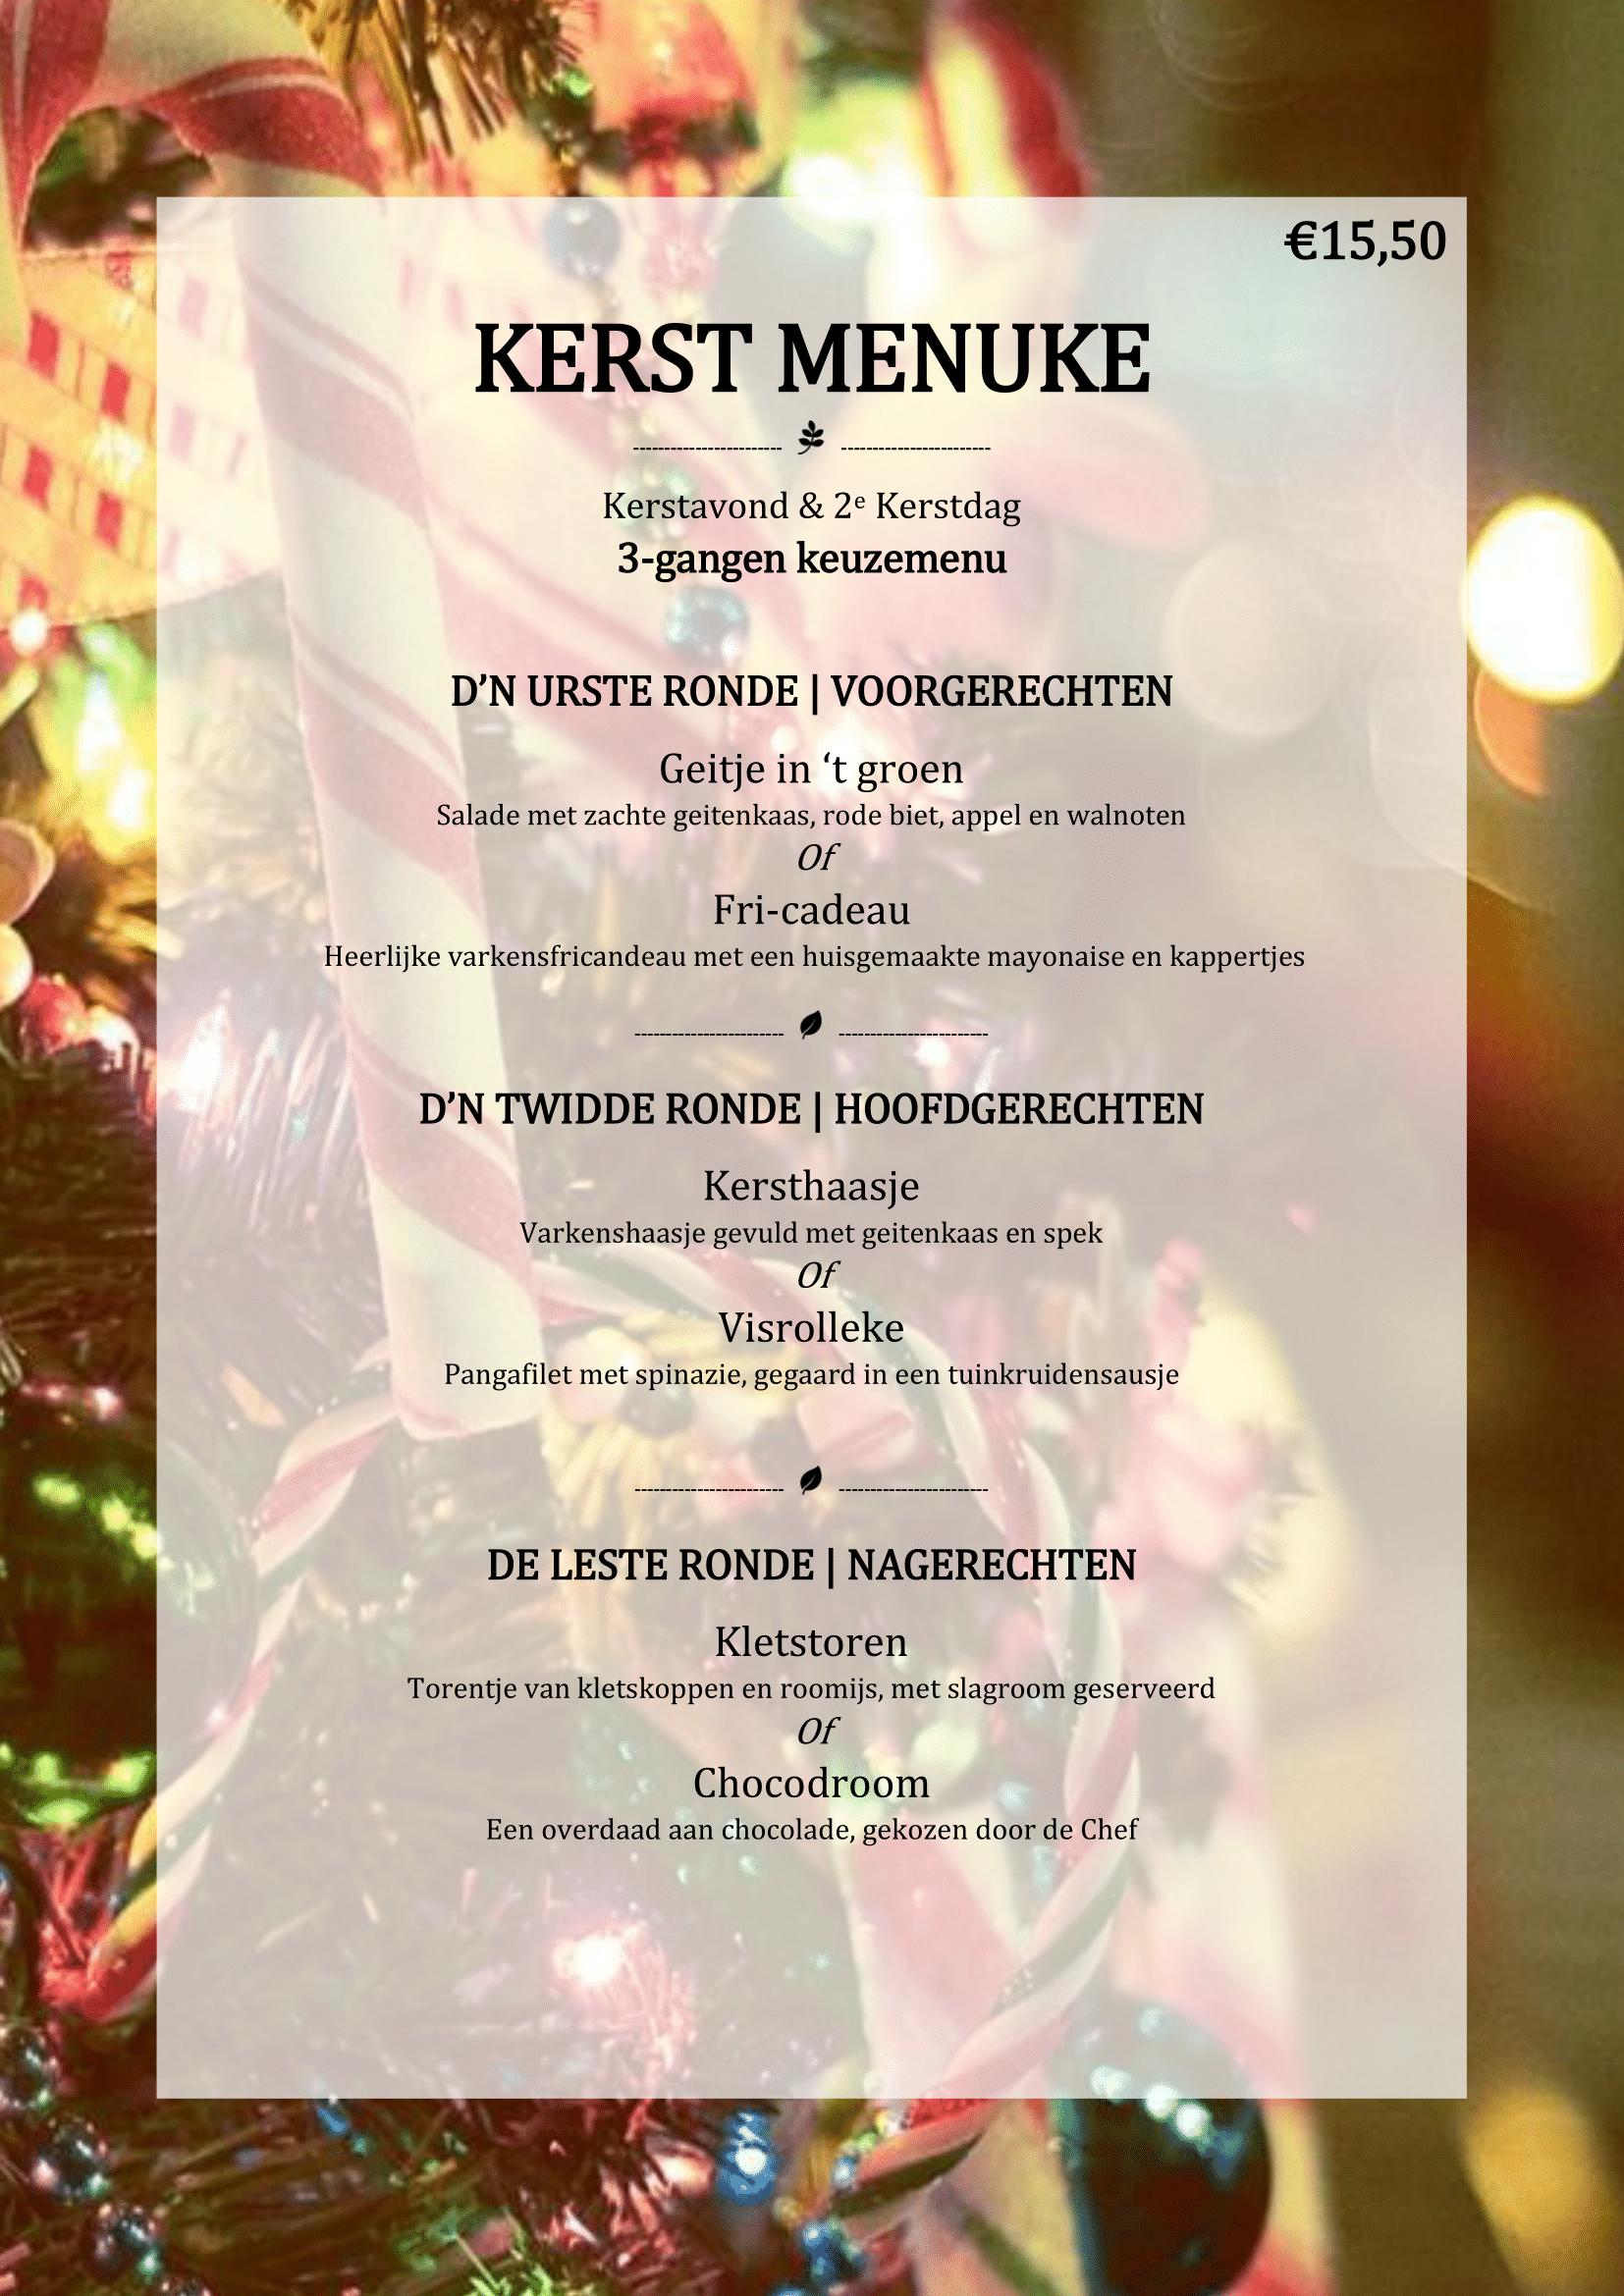 3 Gangen Kerstdiner.Kerstmenu 2017 3 Gangen Gasterij T Dorpsgenot